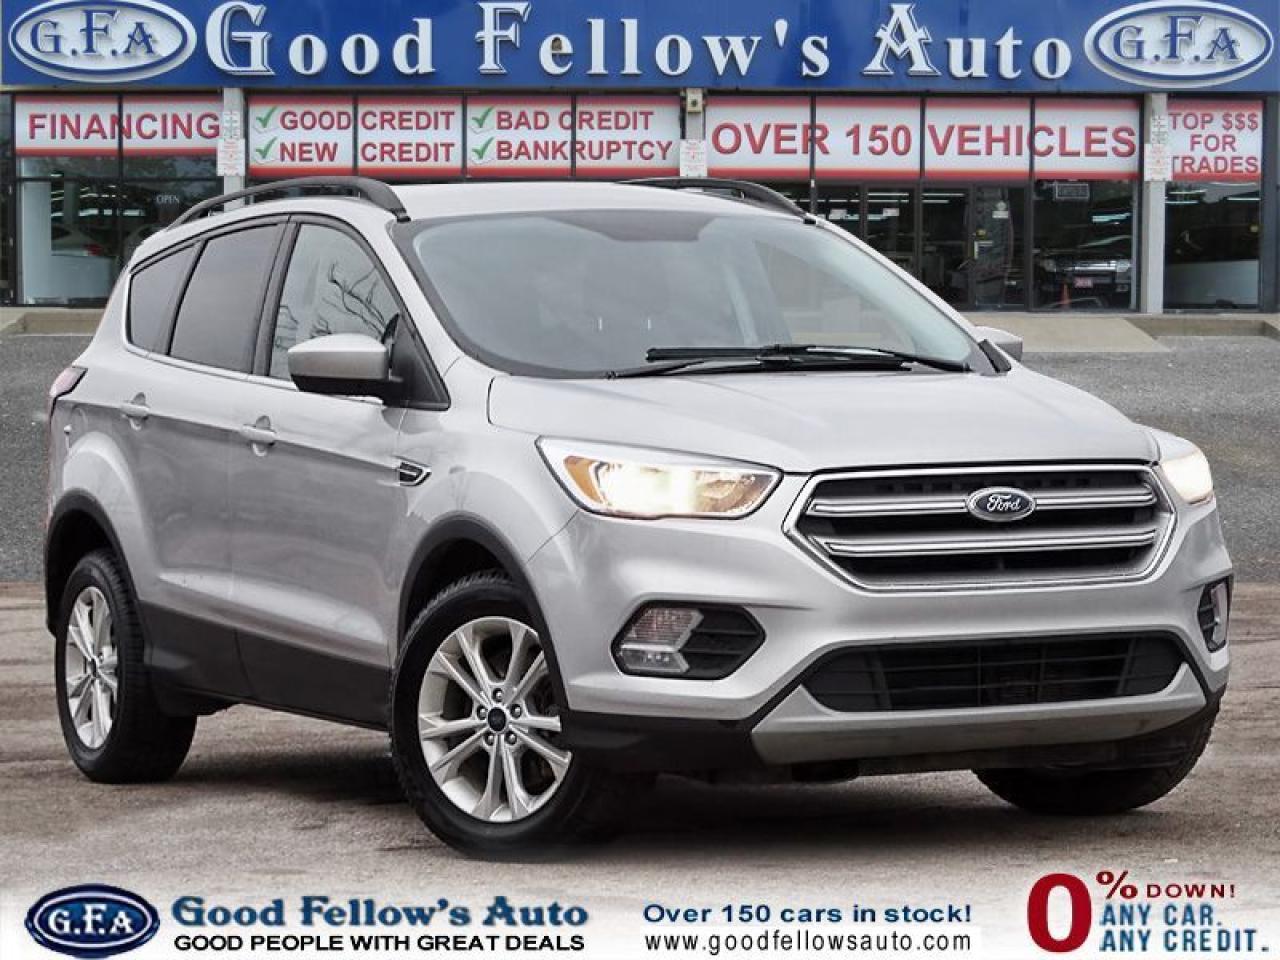 2017 Ford Escape SE MODEL, 1.5 LITER ECOBOOST, AWD, REARVIEW CAMERA